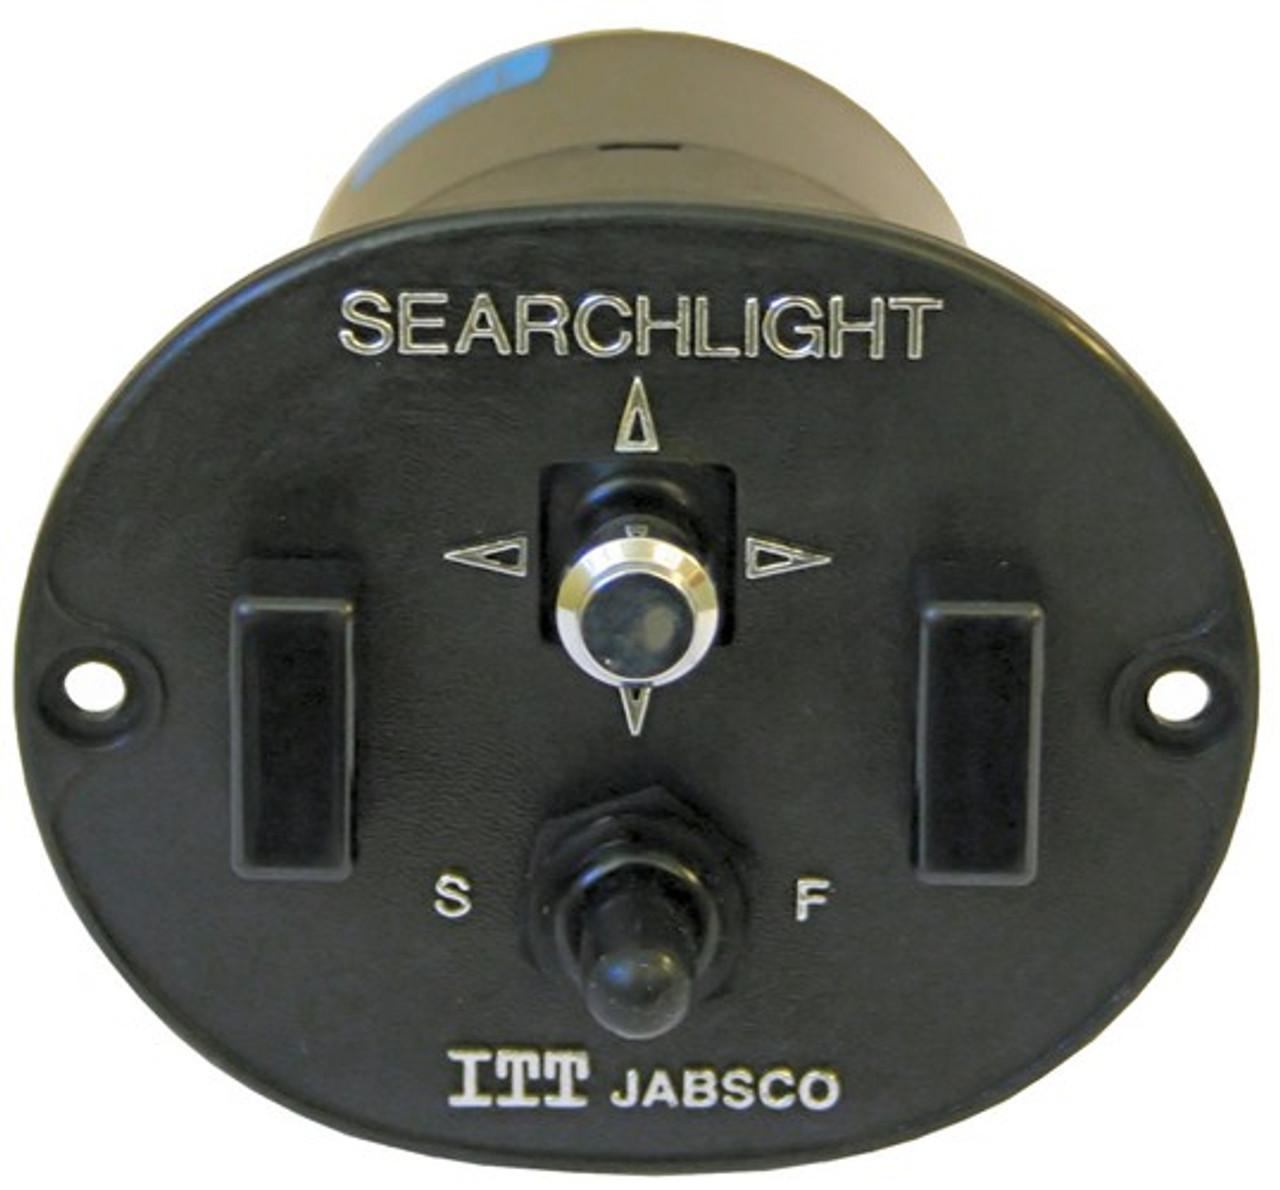 J65-131 Jabsco 43670-0003: Control Panel Searchlights